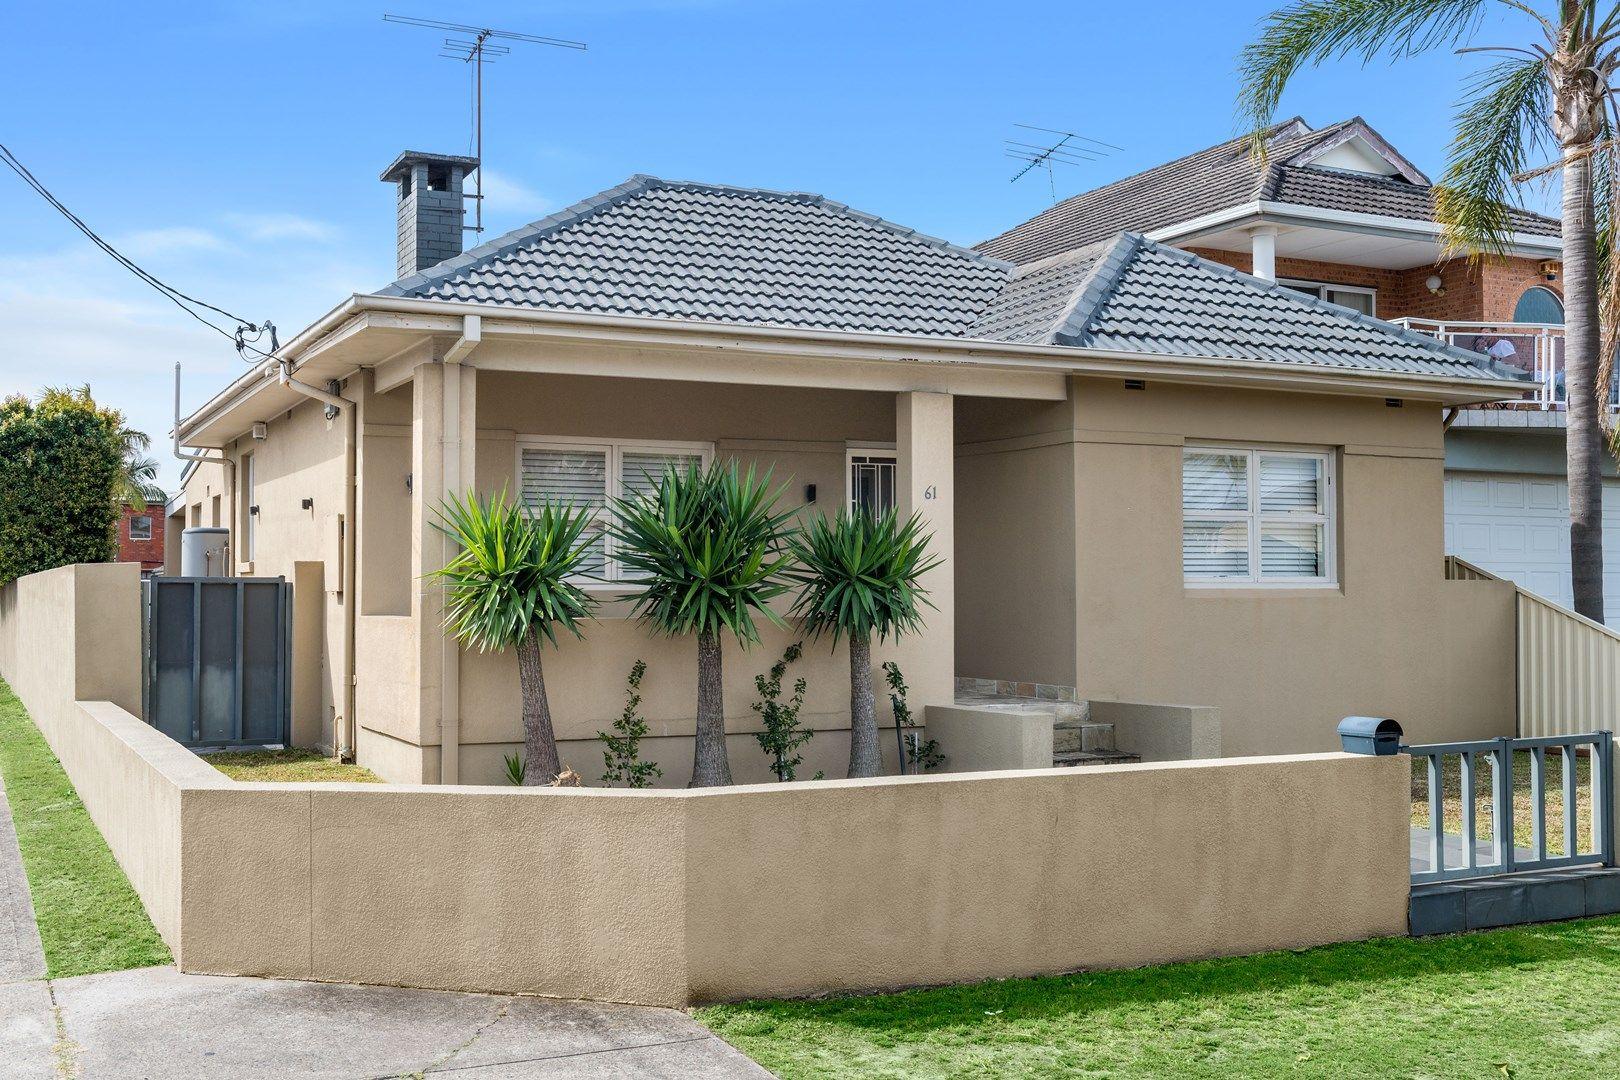 61 Scarborough St, Monterey NSW 2217, Image 0